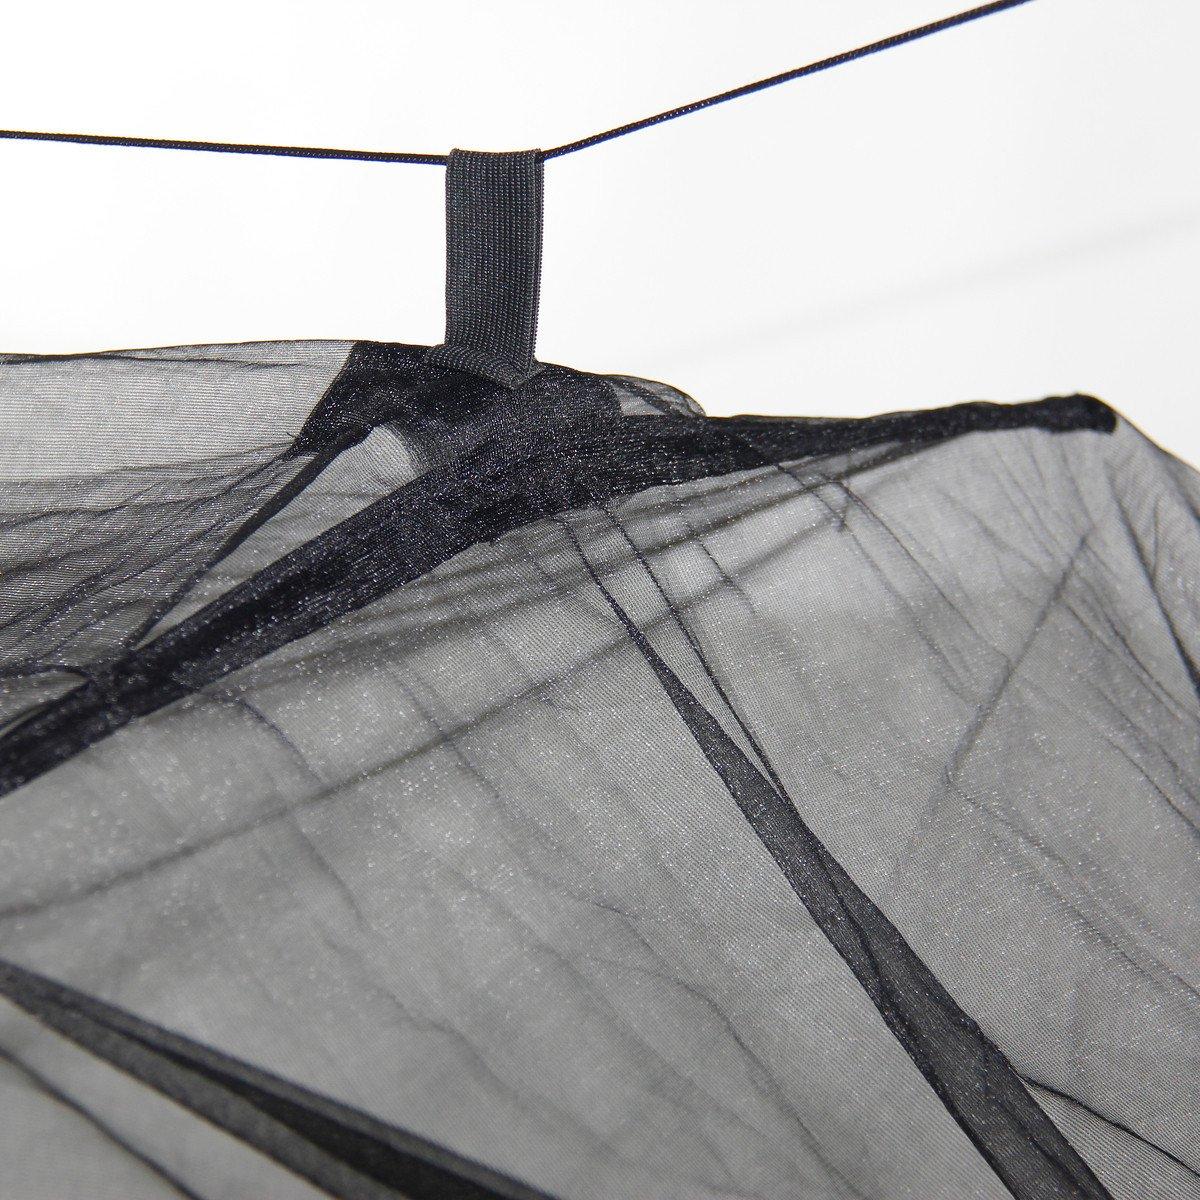 amazon    moskito kakoon mosquito   camping hammock by byer of maine  sports  u0026 outdoors amazon    moskito kakoon mosquito   camping hammock by byer      rh   amazon